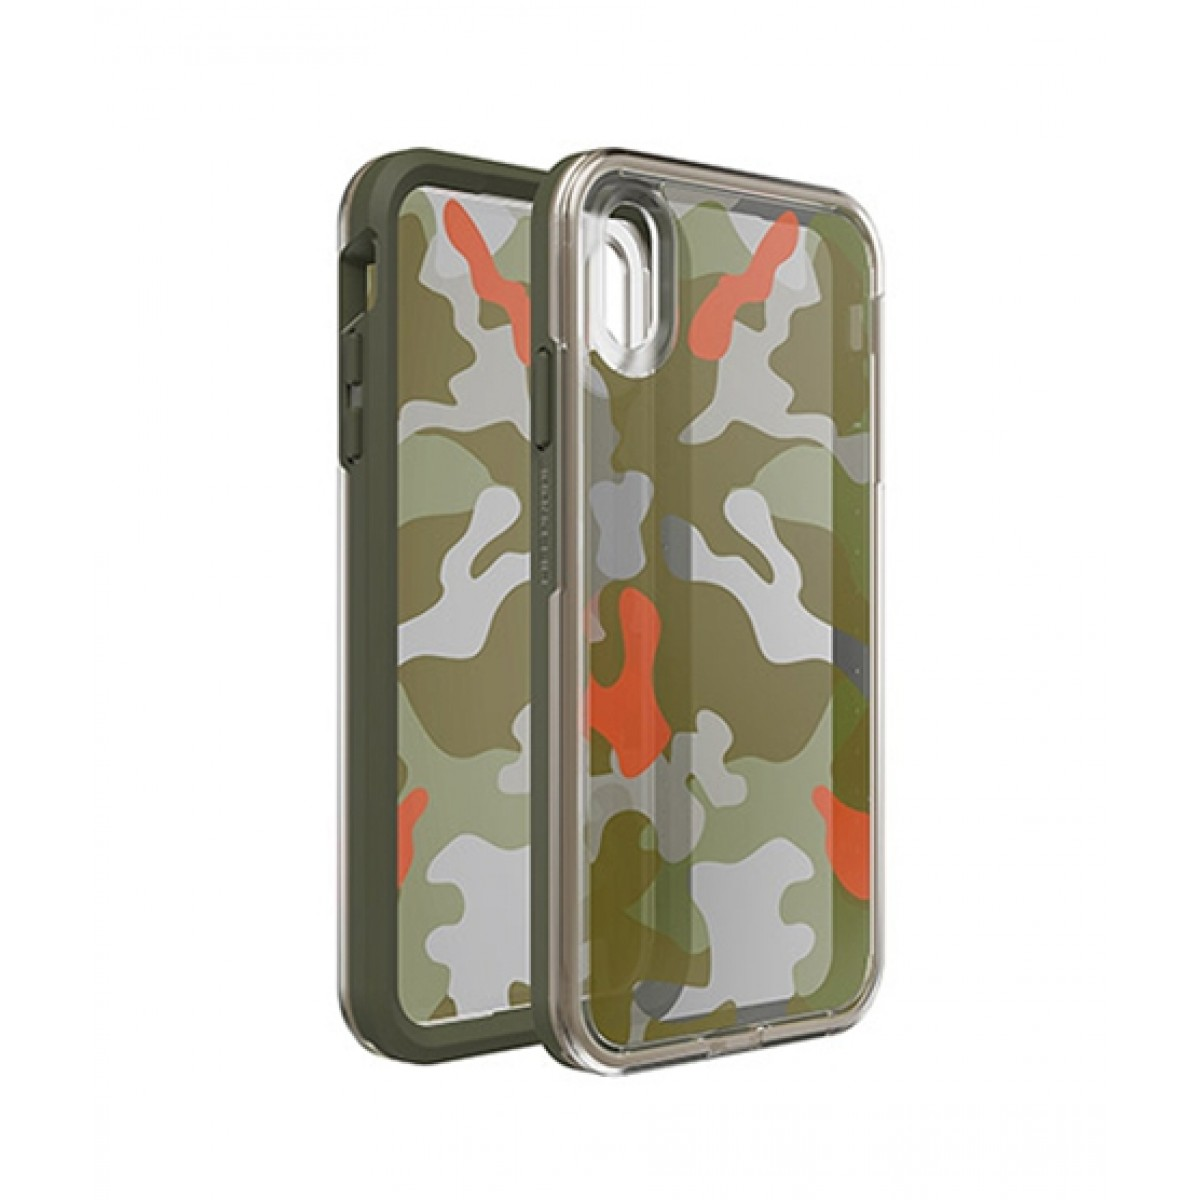 online store 92ada ea143 LifeProof Slam Woodland Camo Case For iPhone XS Max